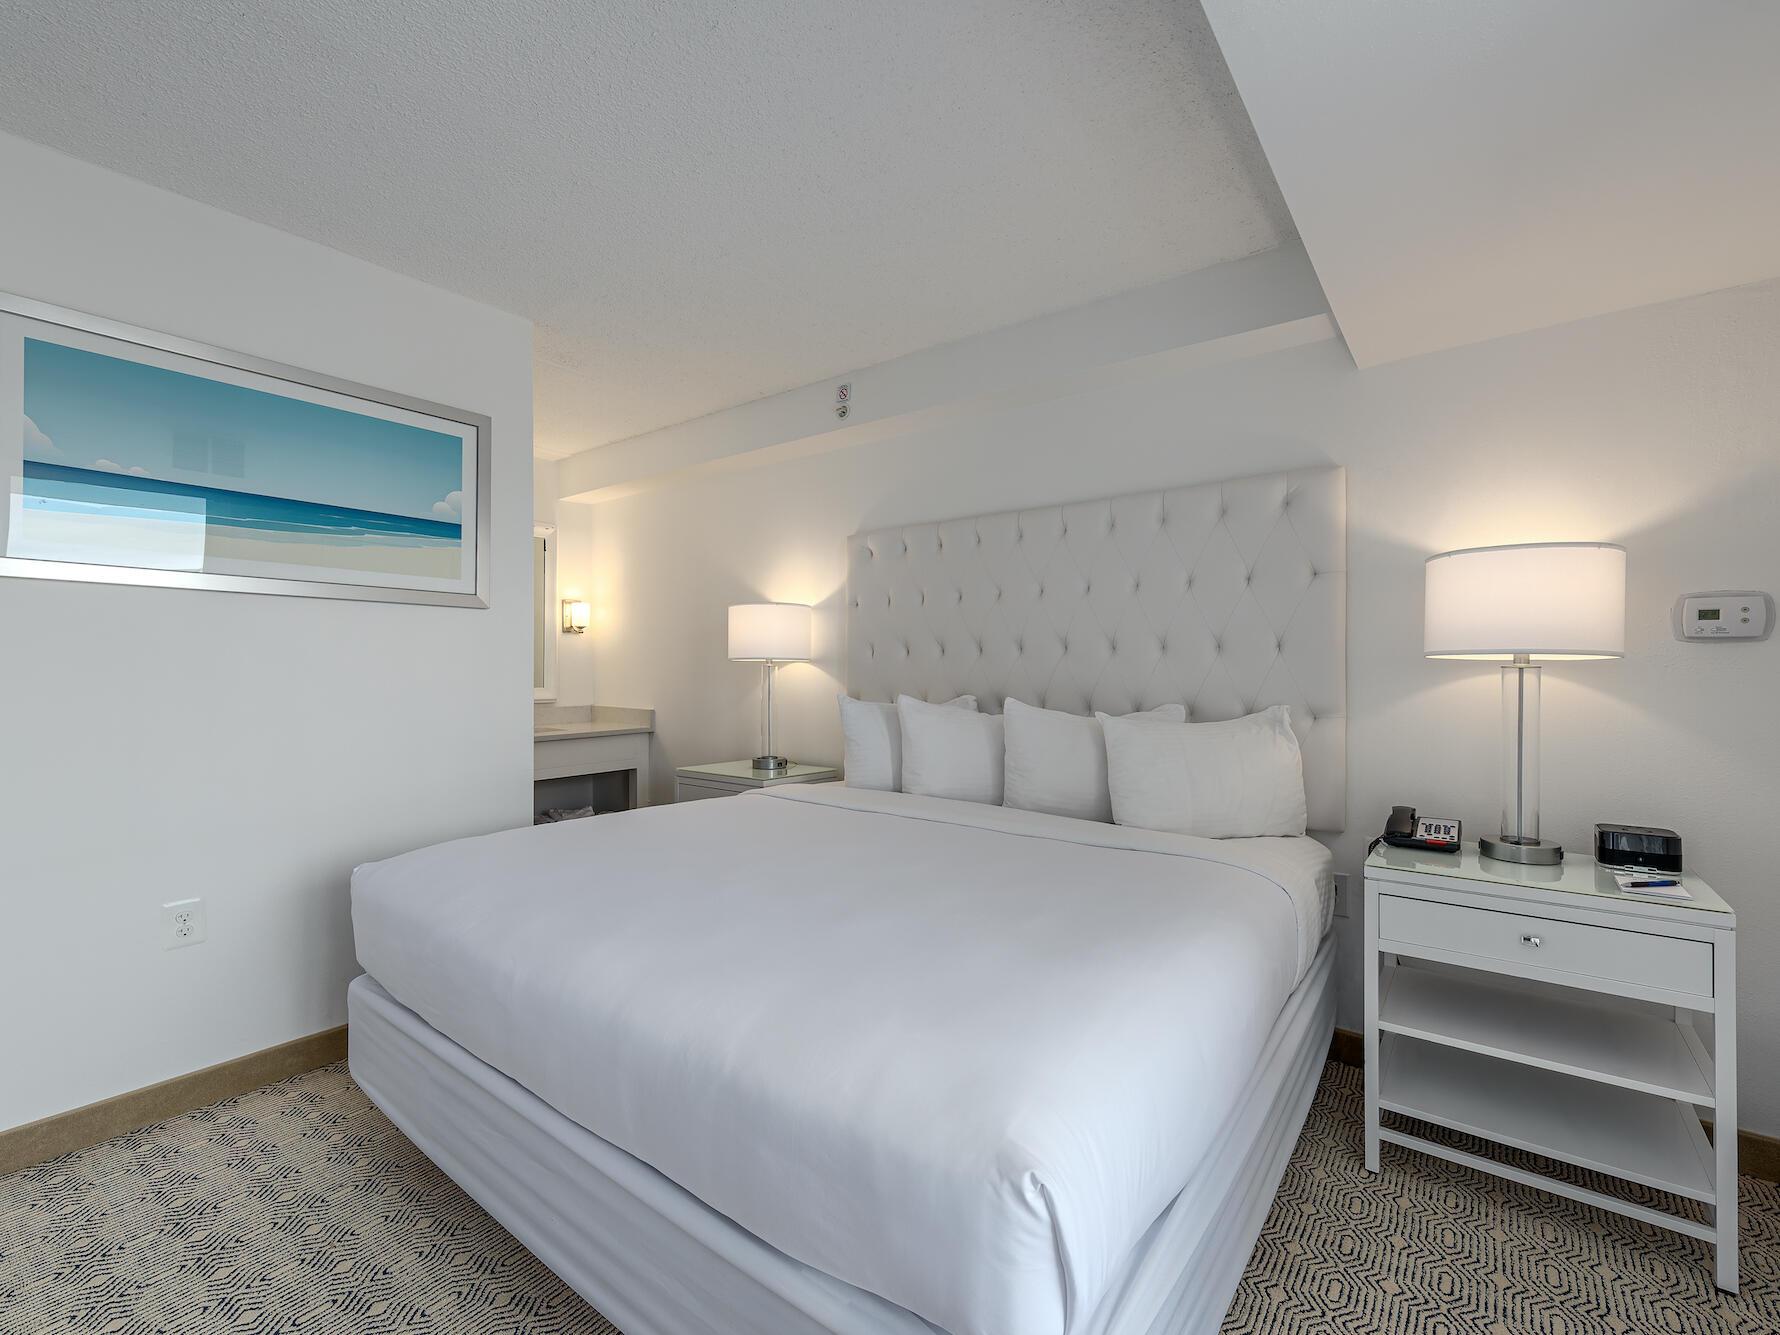 Signature King Suite ICONA Diamond Beach Resort Hotel near Cape May NJ